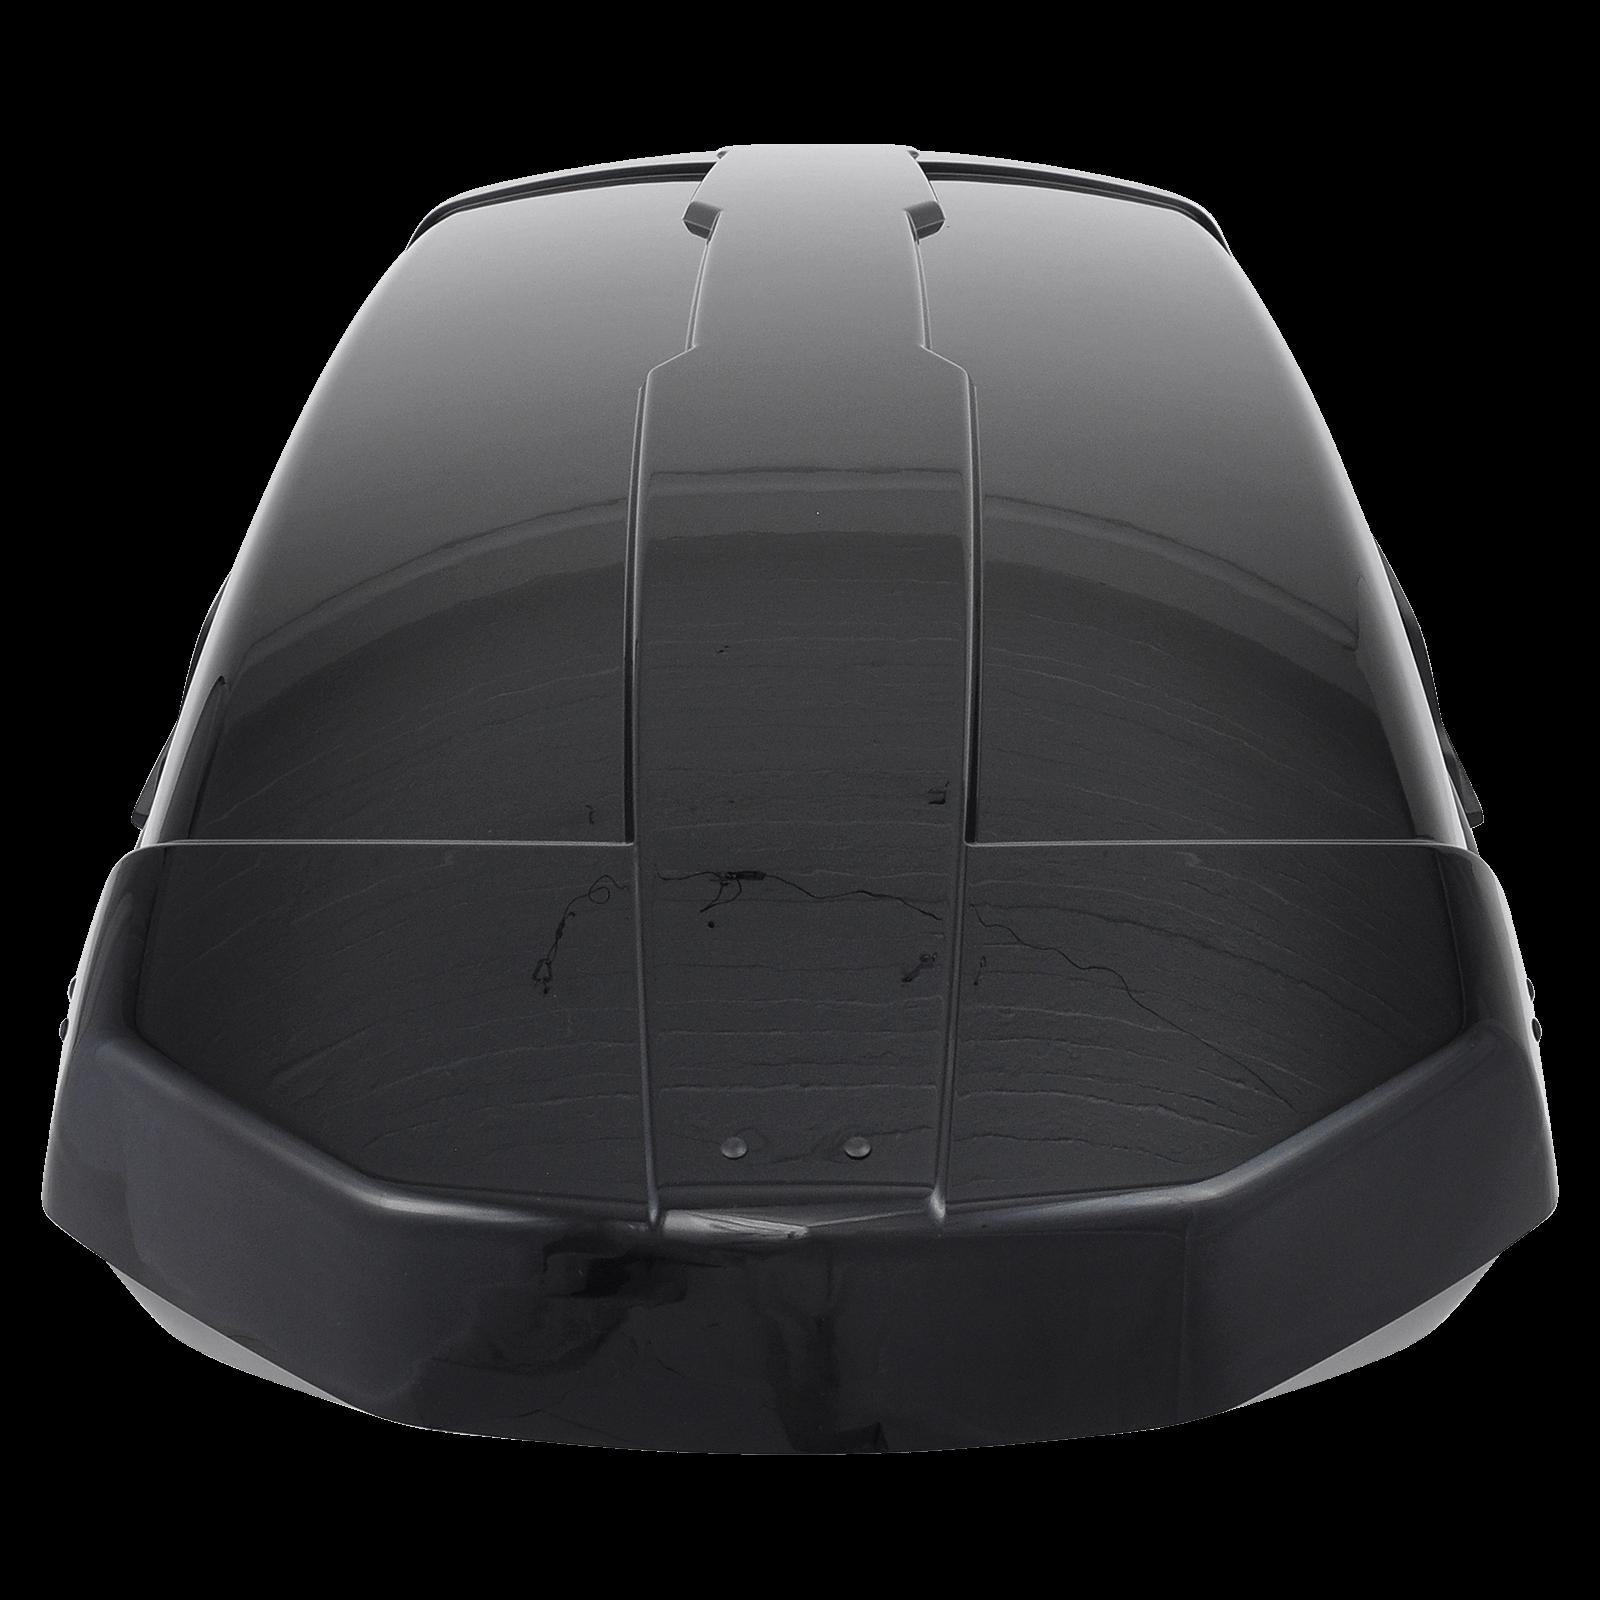 Dachbox Thule Motion XT XL Black Glossy - Bild 3